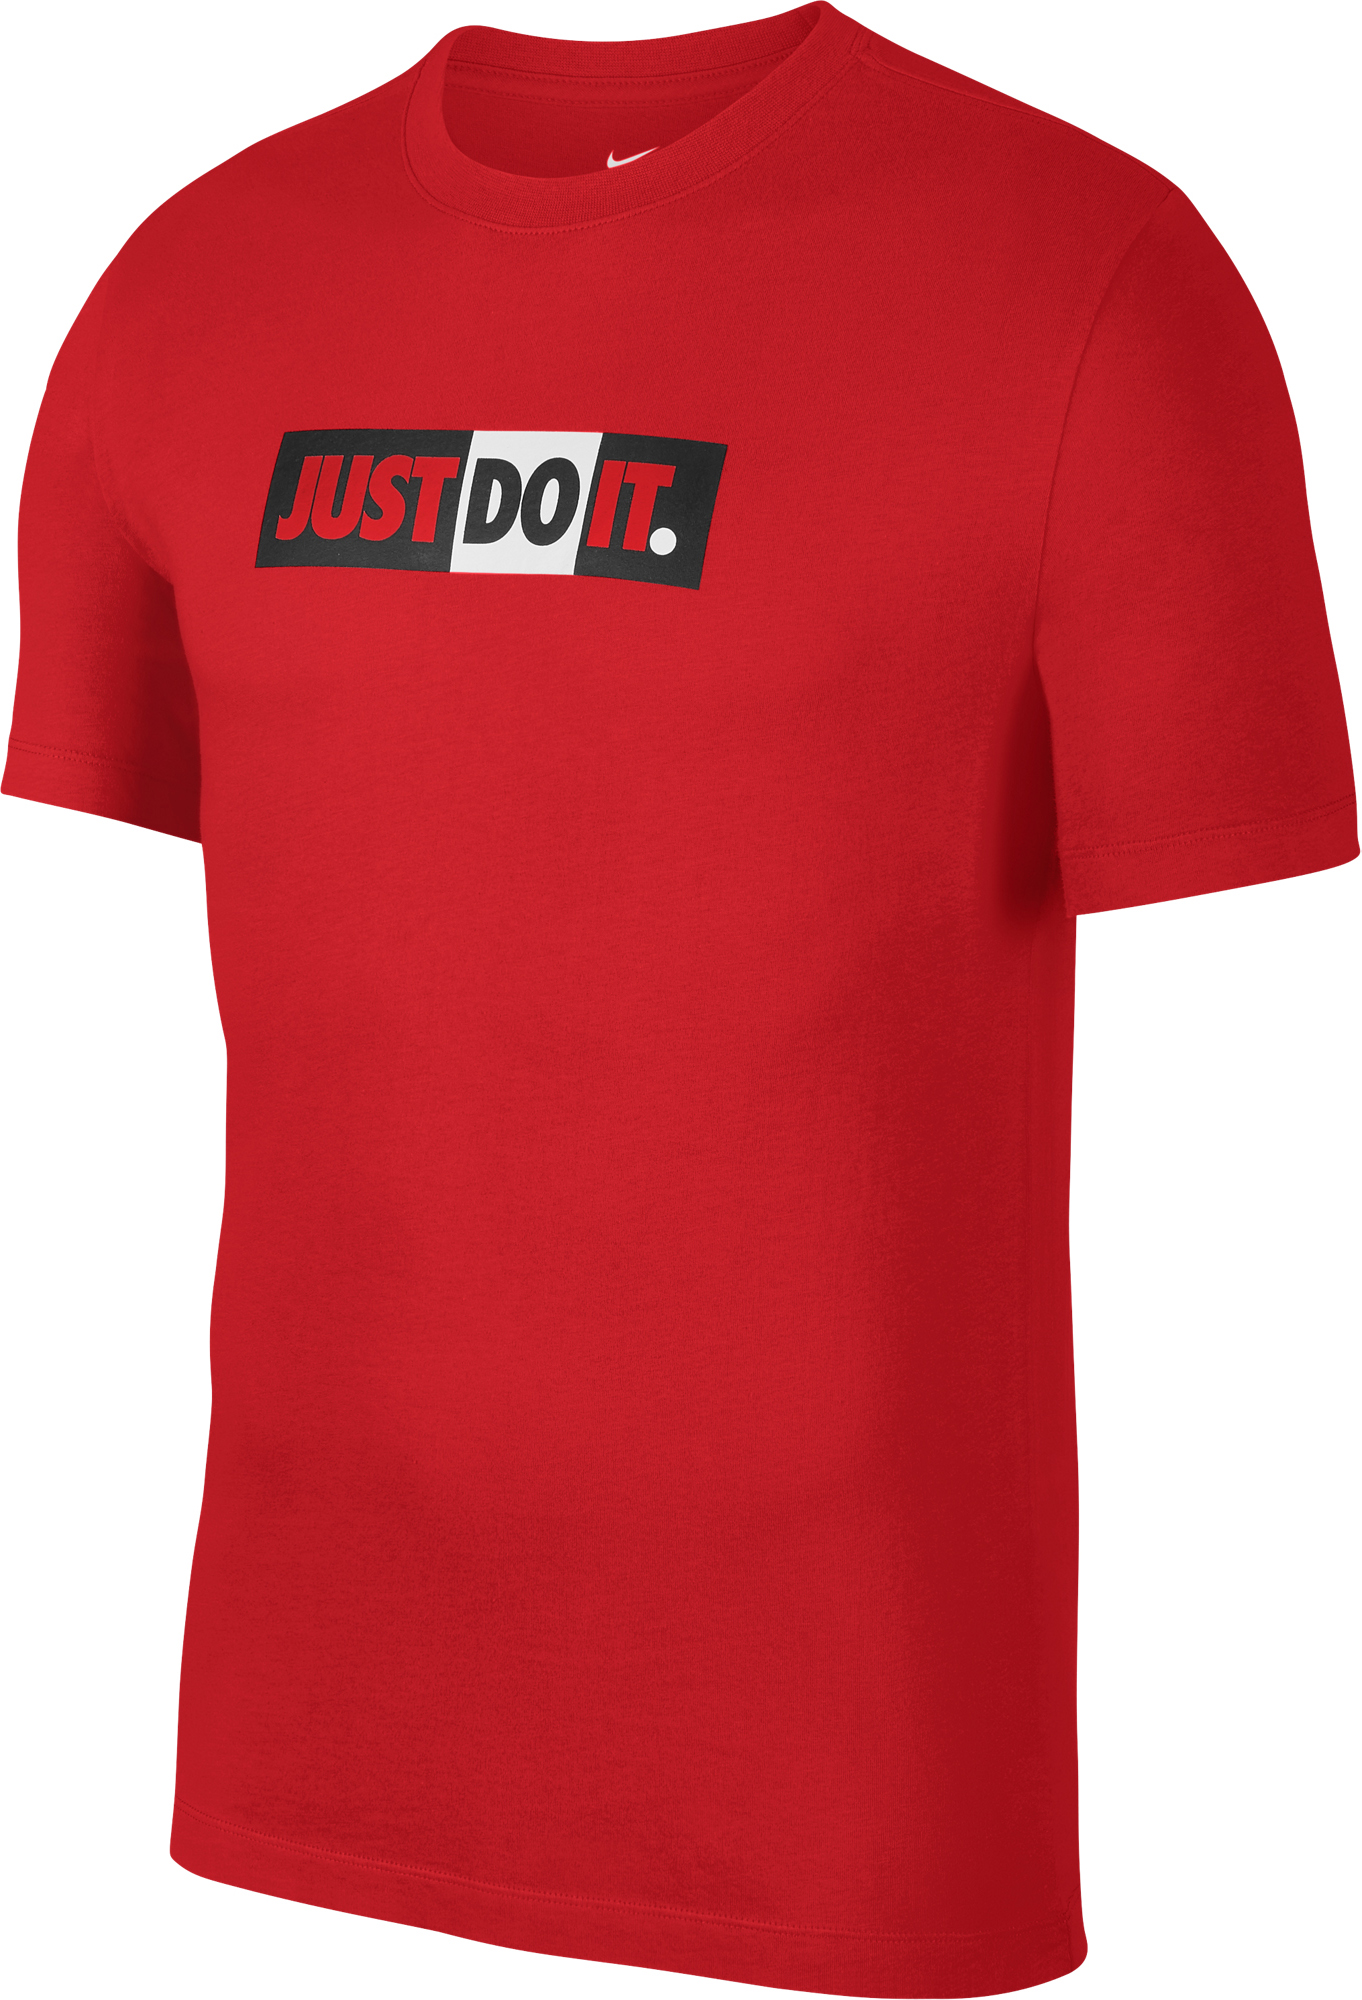 Фото - Nike Футболка мужская Nike Sportswear JDI, размер 50-52 nike свитшот мужской nike sportswear just do it размер 52 54